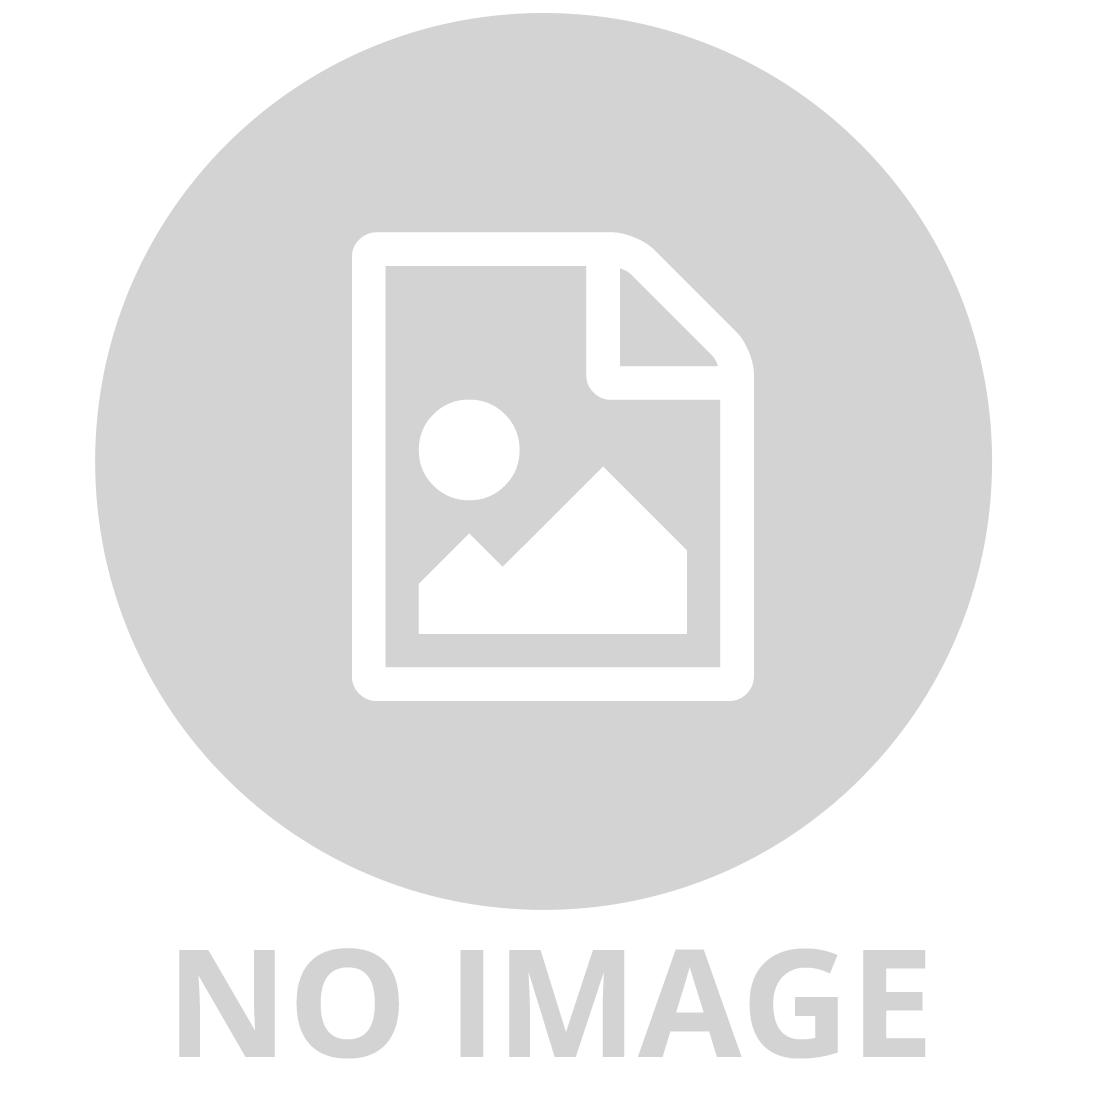 RAVENSBURGER 3000 PIECE PUZZLE NORTH AMERICAN SKYLINE